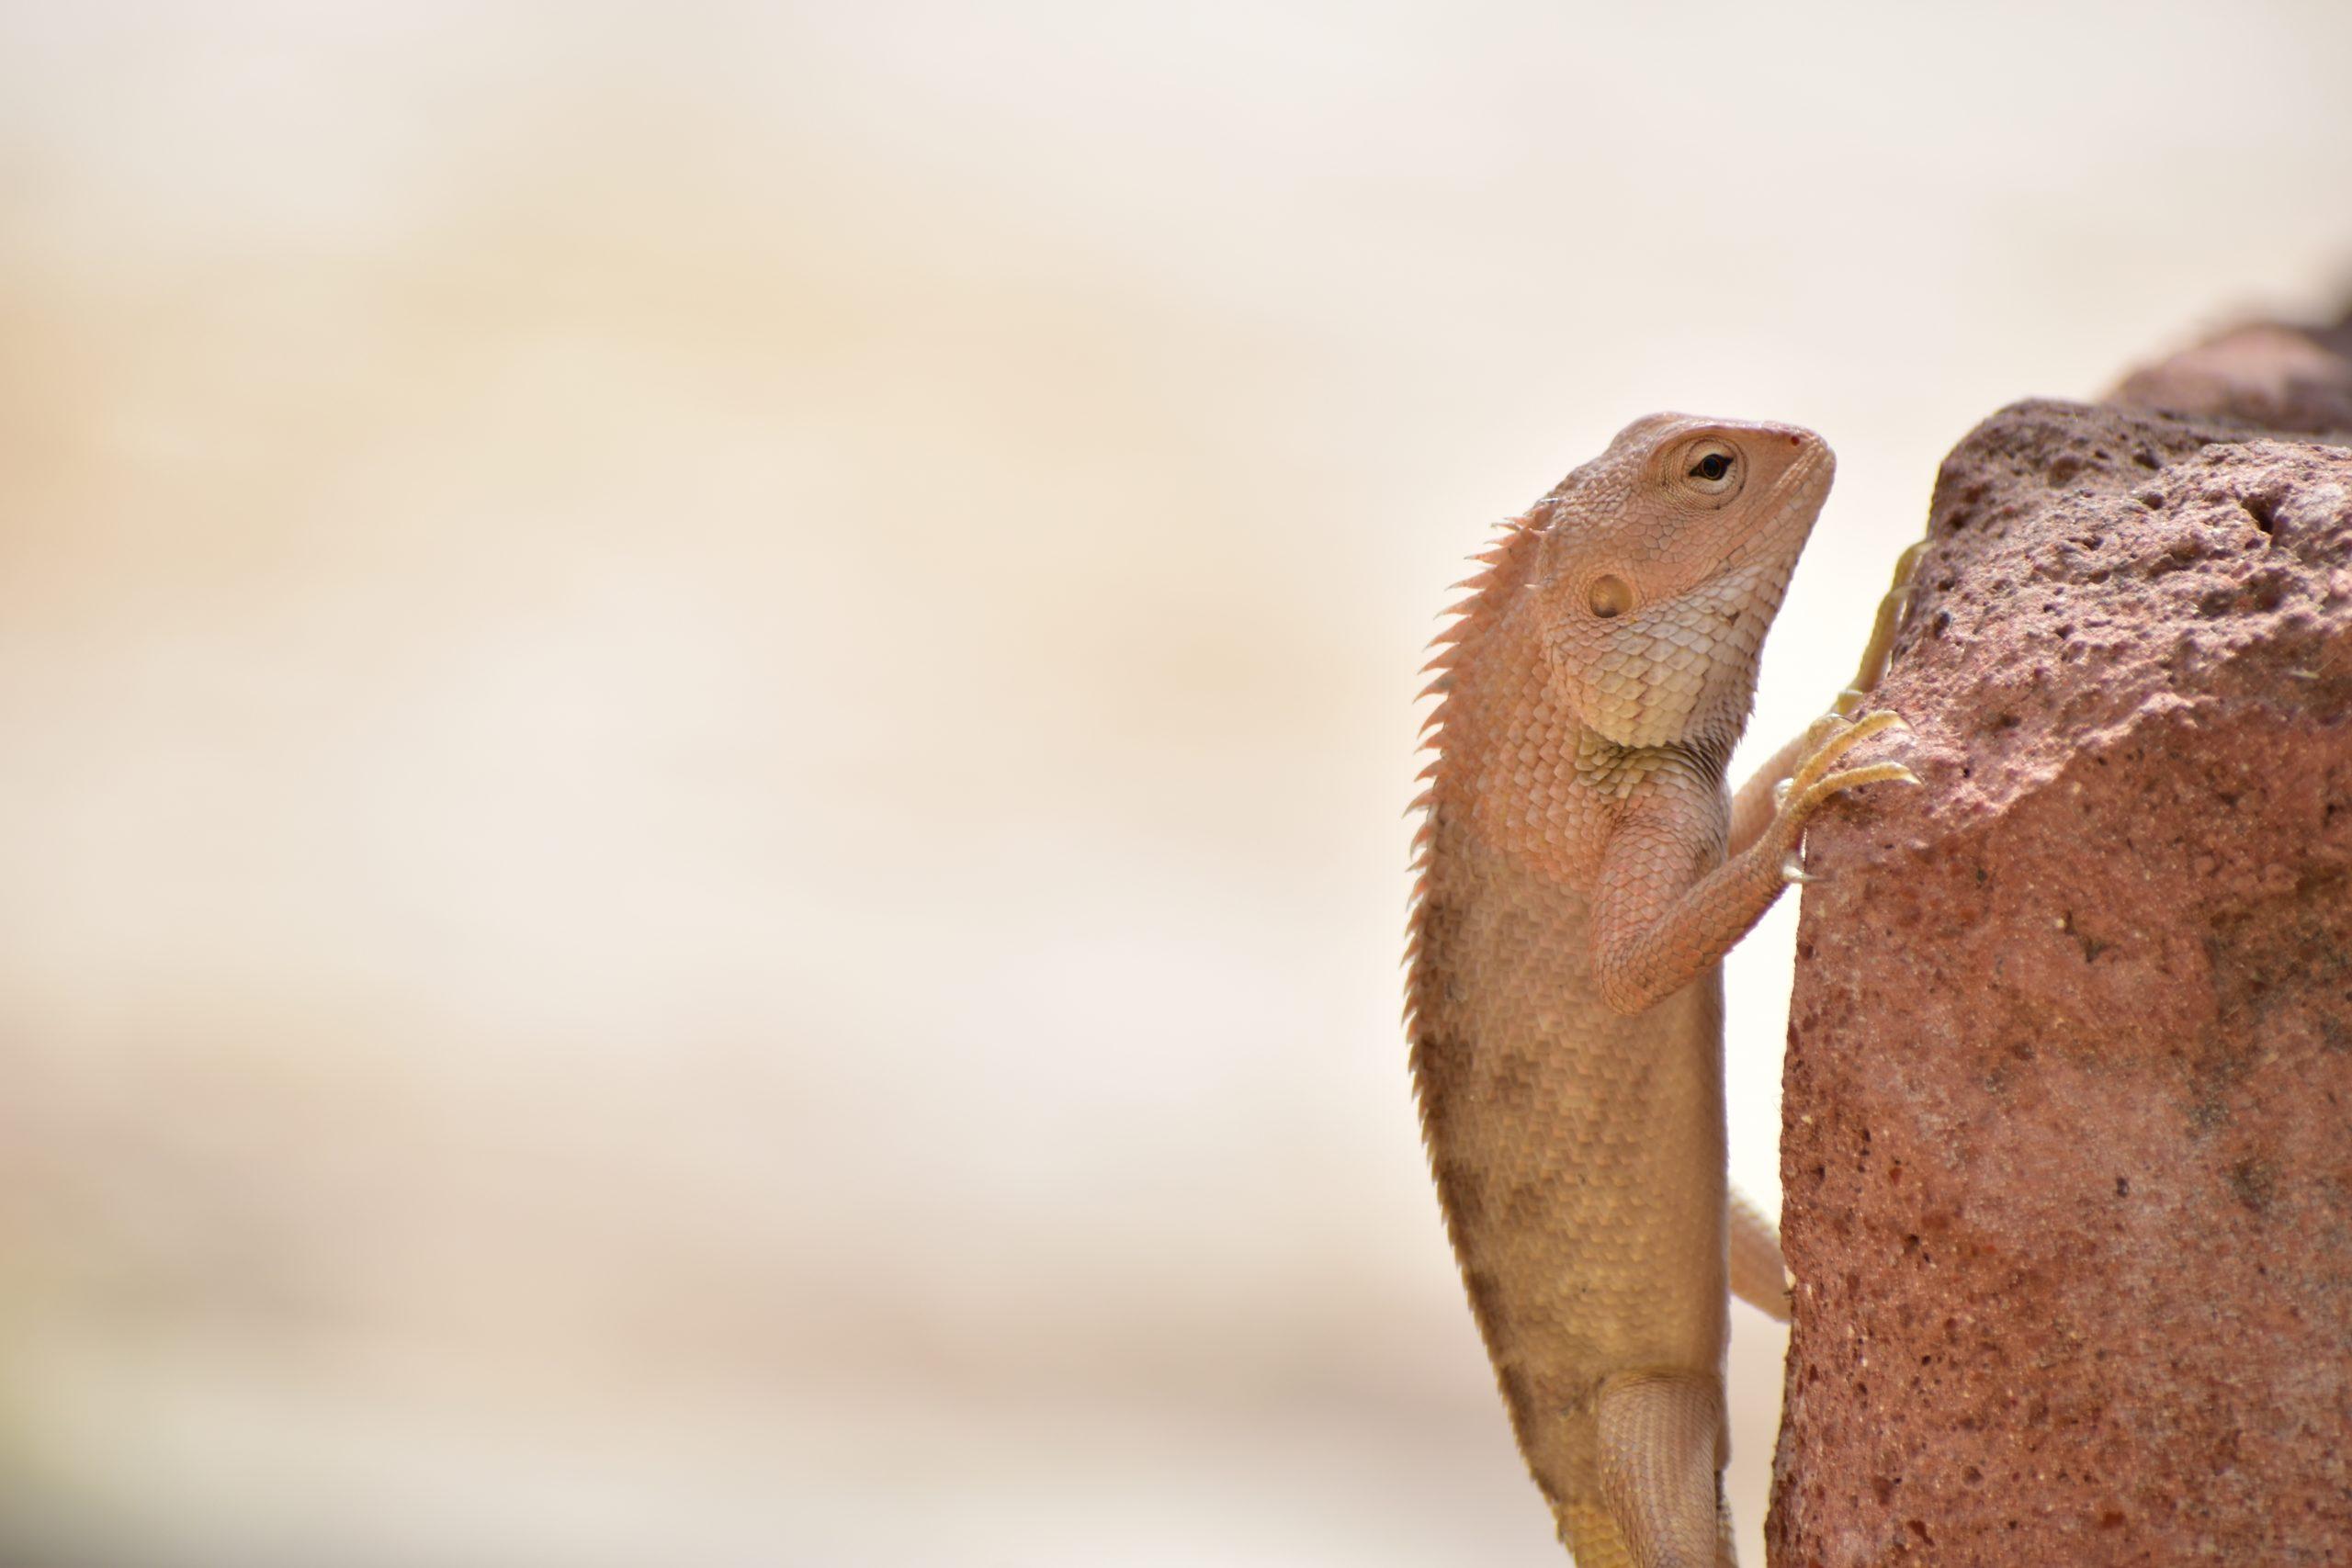 A chameleon on a rock